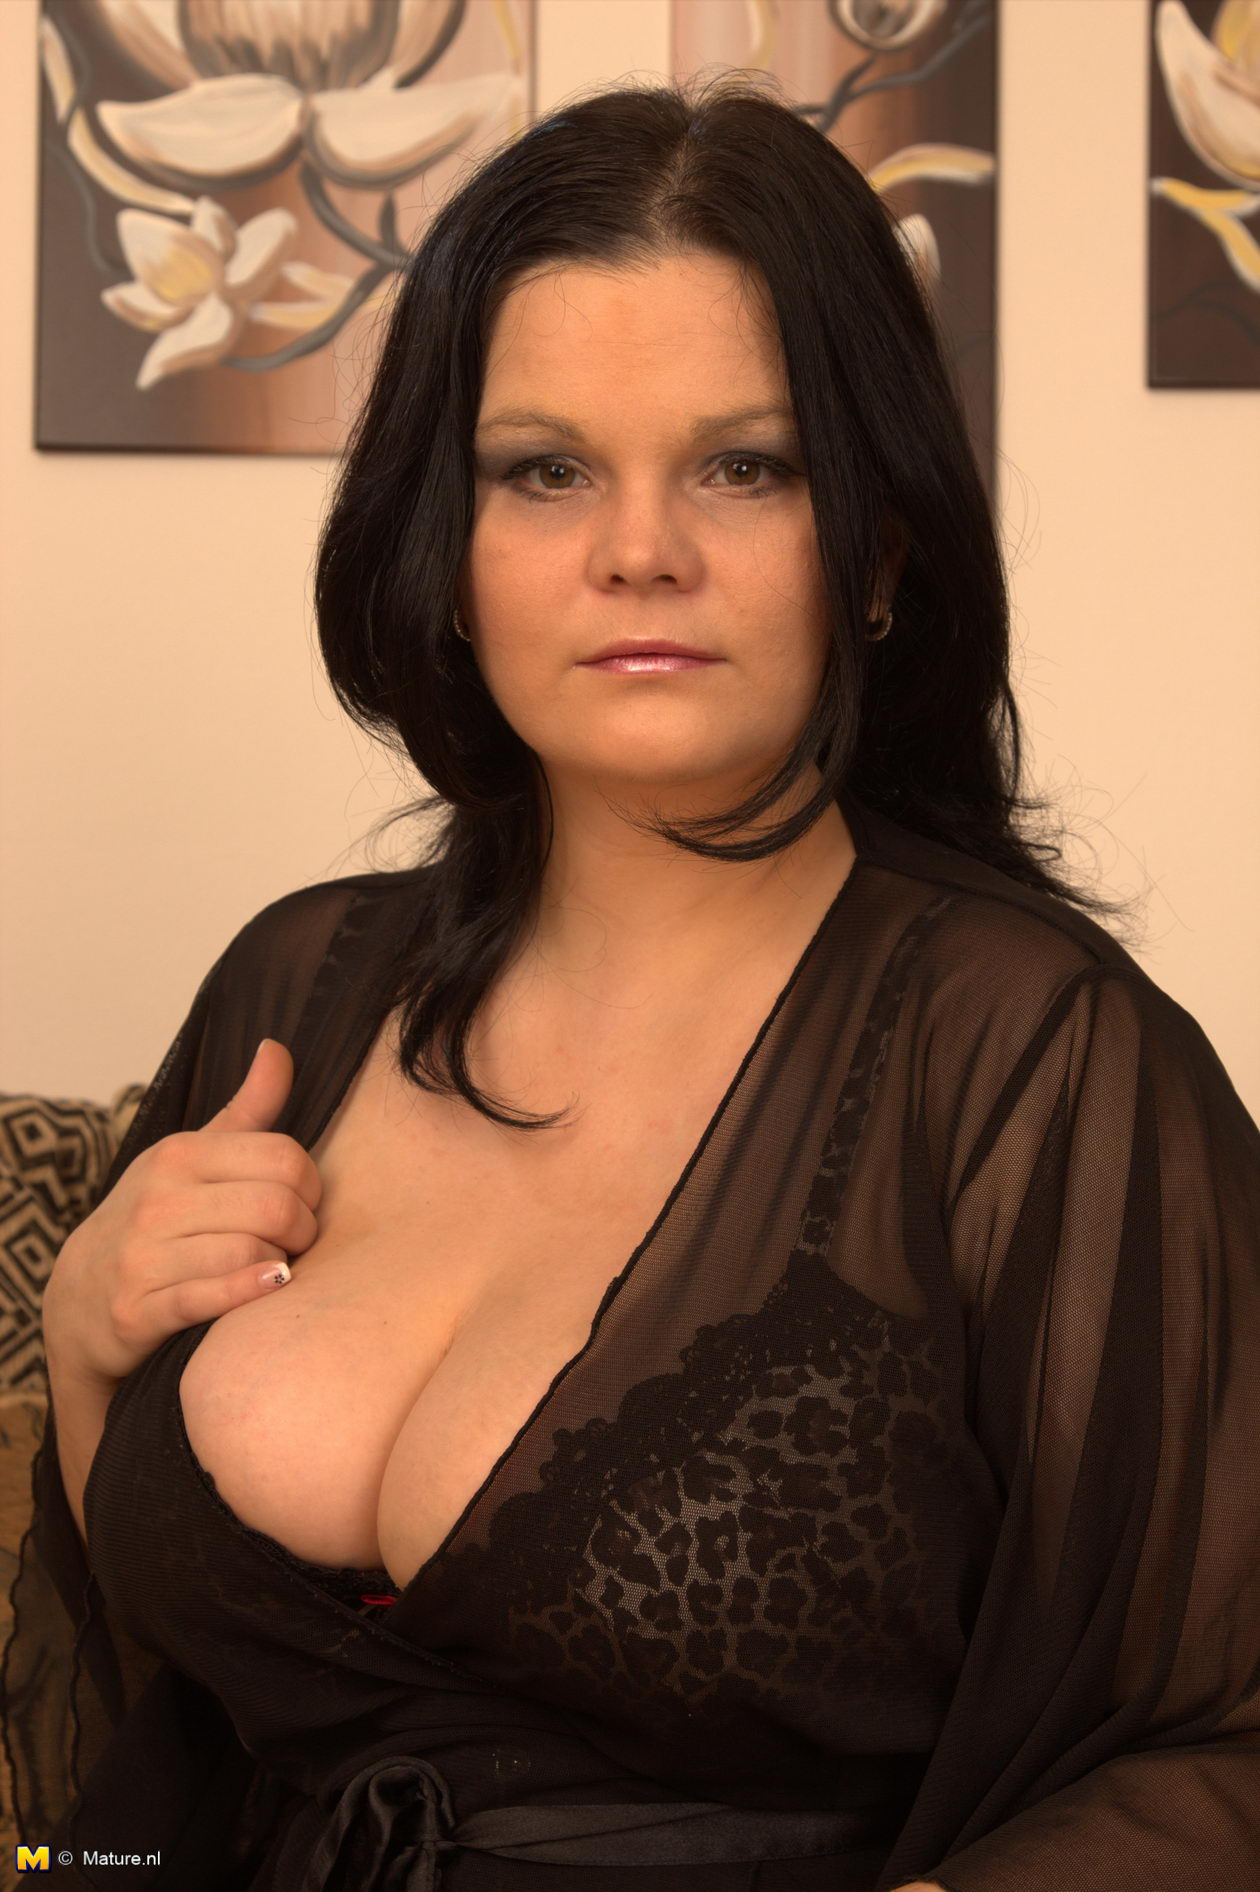 Lovely milf with huge boobs pleasures herself 7